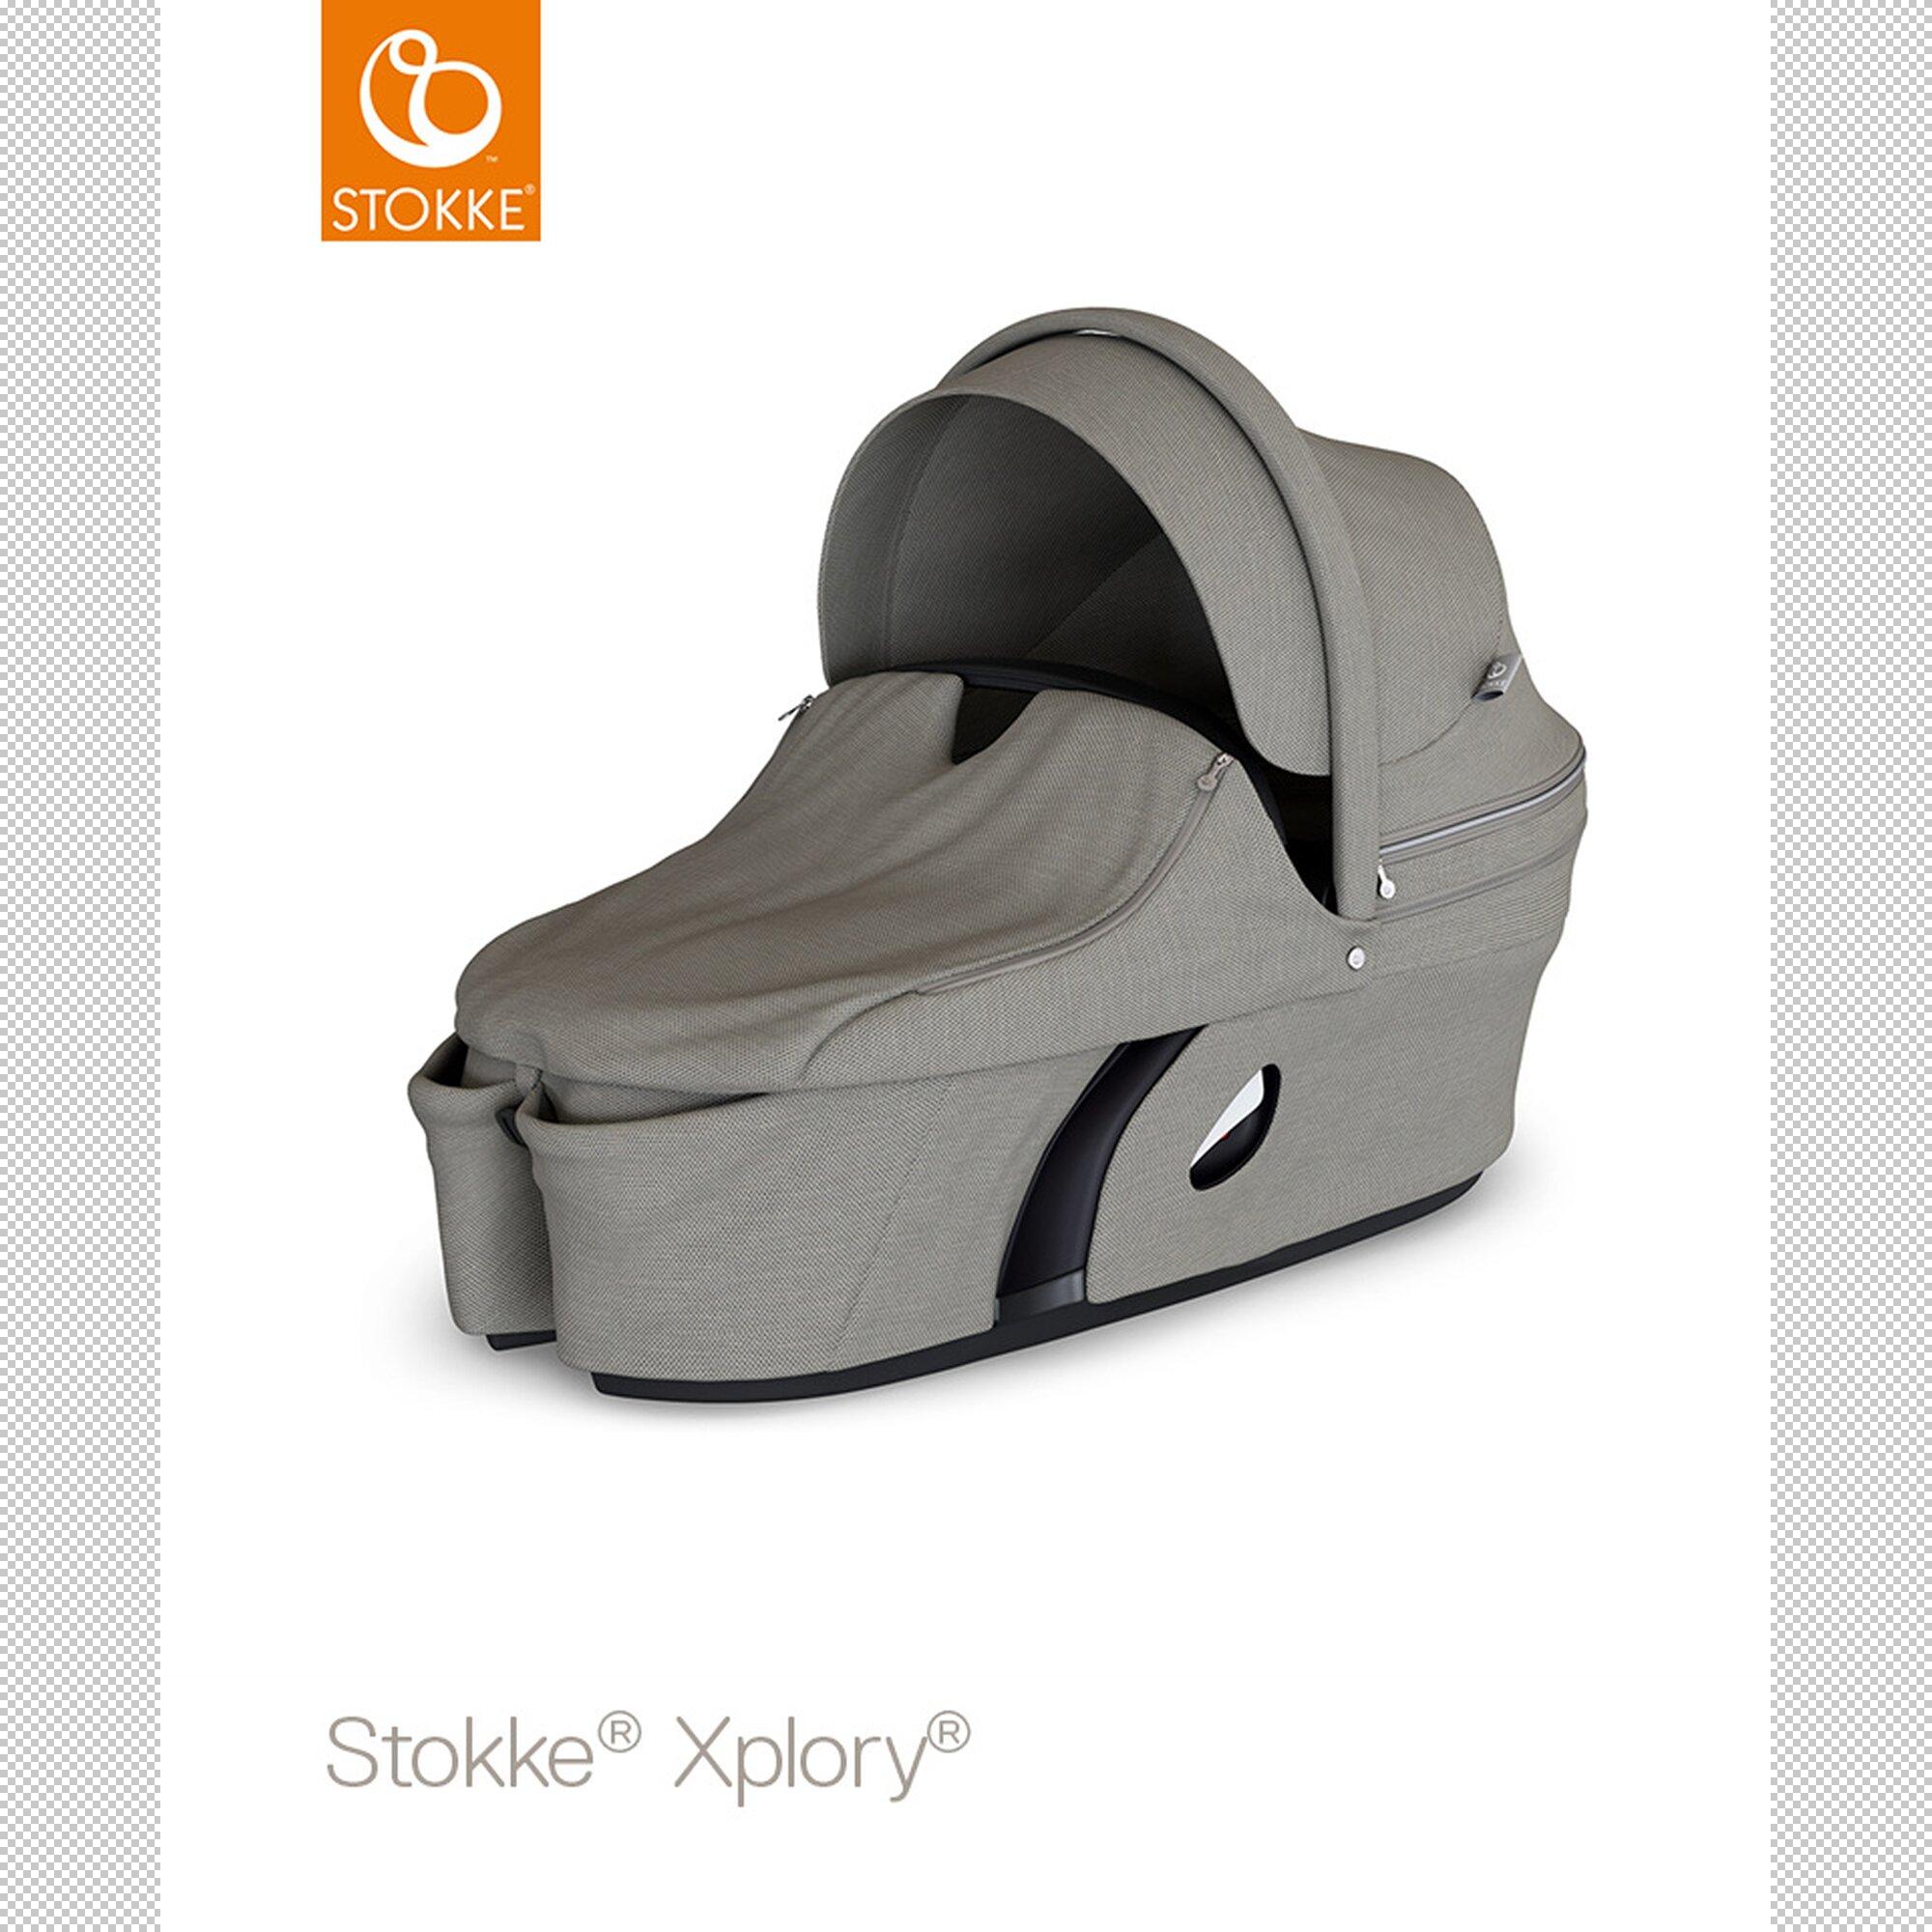 Xplory® V6 Tragewanne